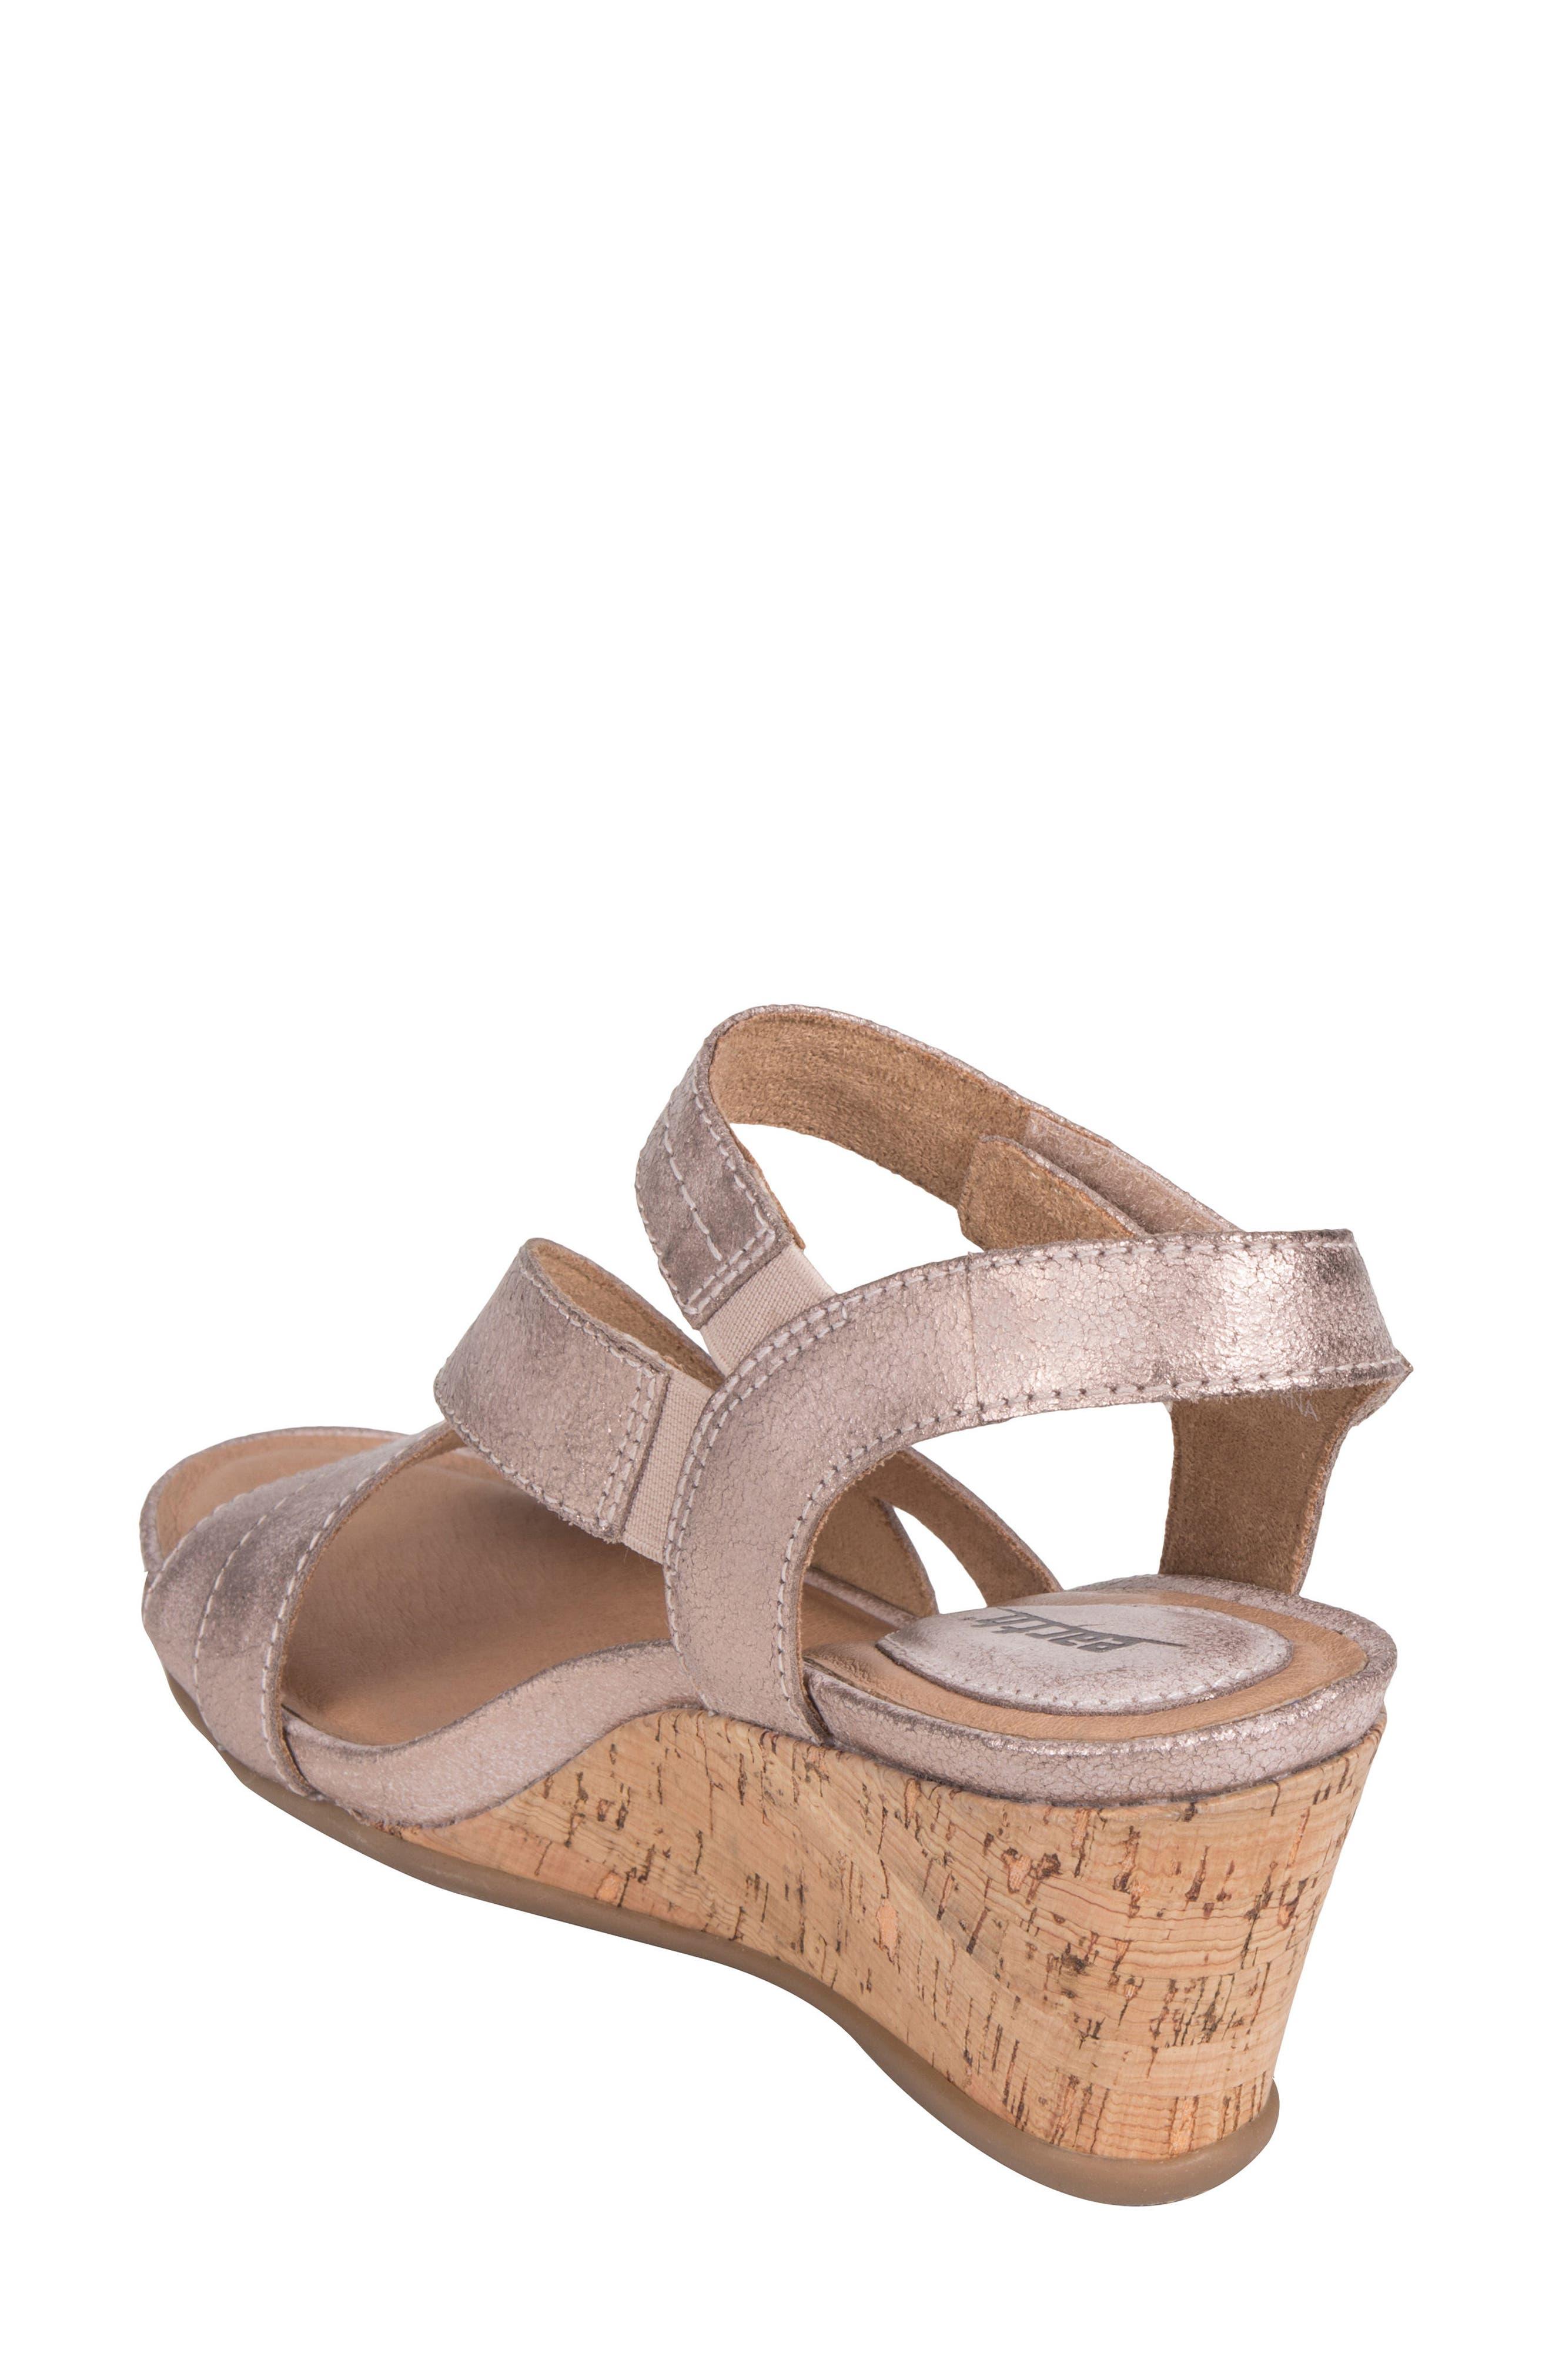 Thistle Wedge Sandal,                             Alternate thumbnail 8, color,